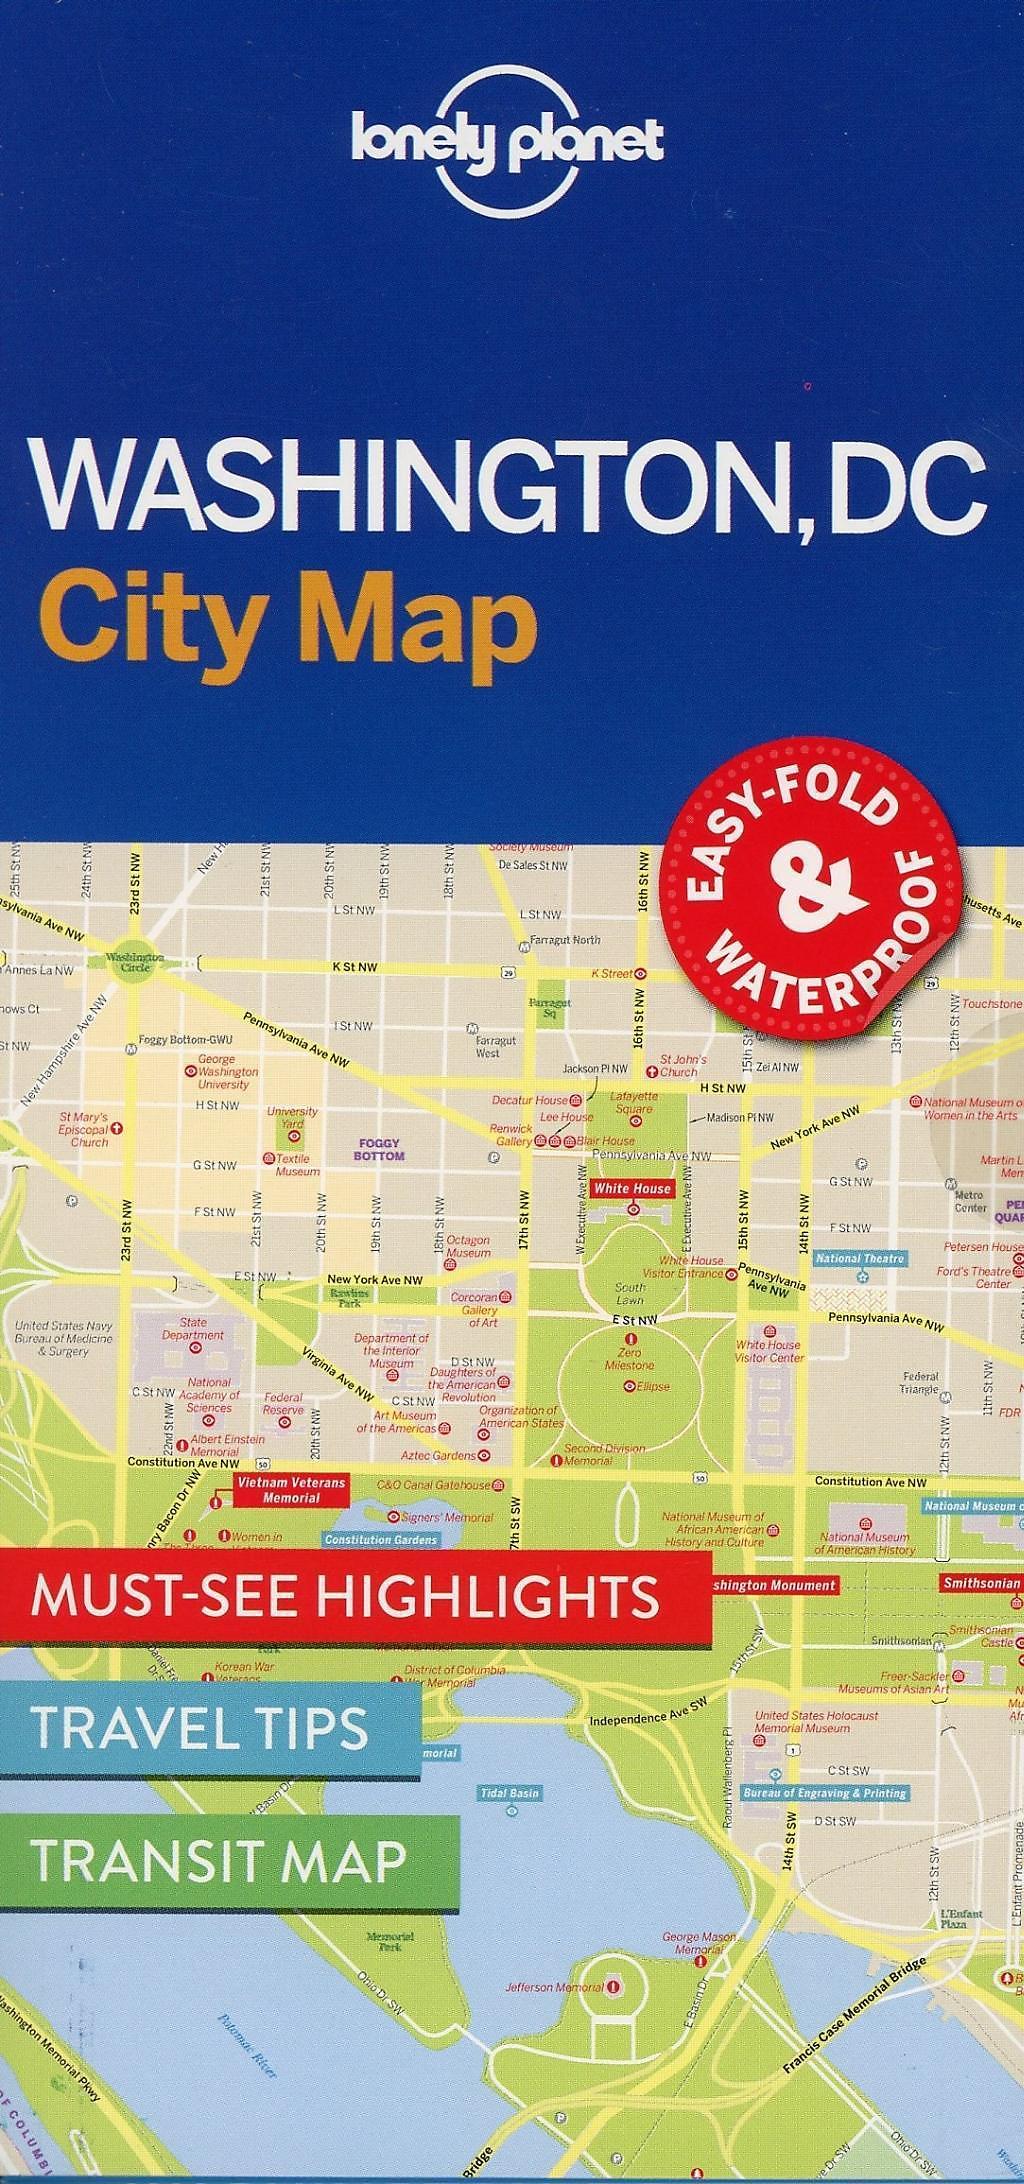 Lonely Planet Washington DC City Map Buch bestellen - Weltbild.de